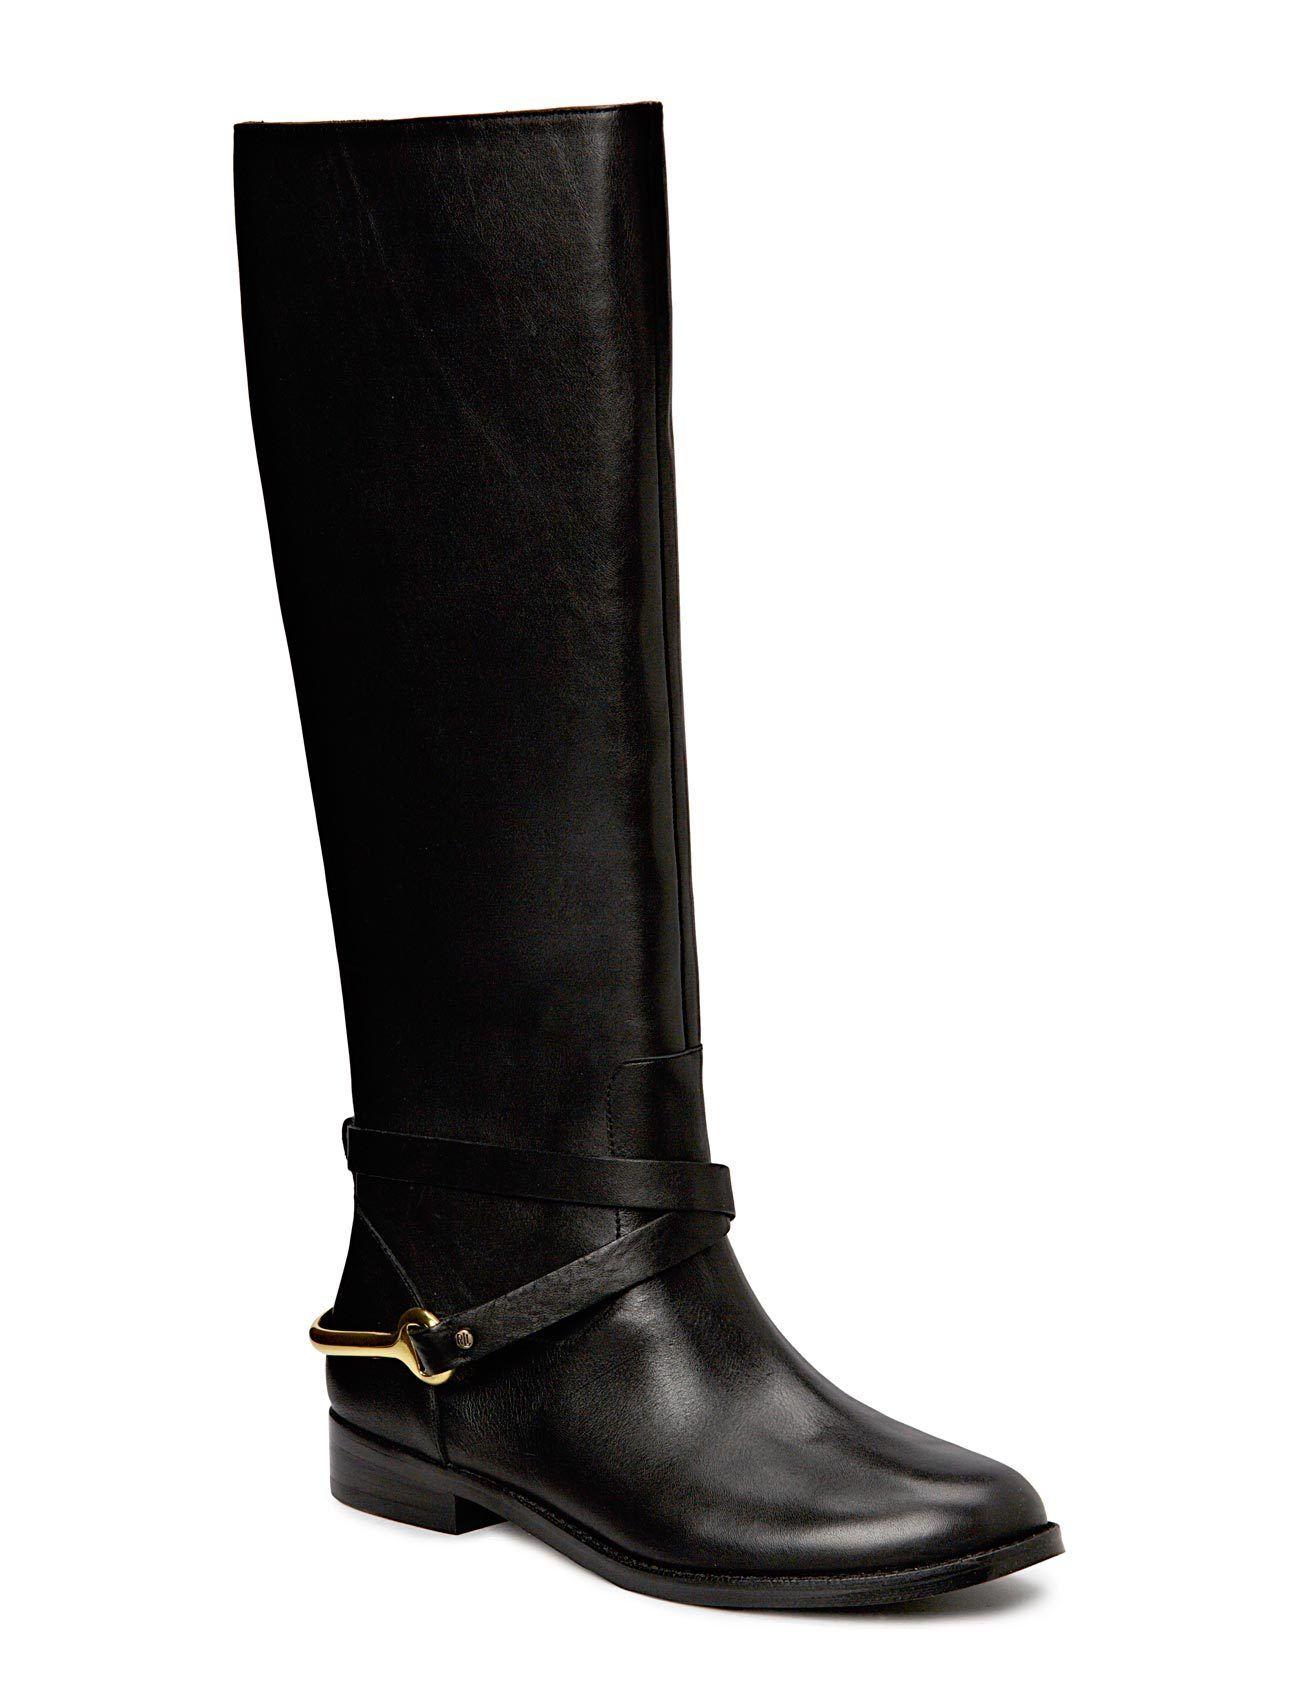 Classic essentials, perfect Ralph Lauren boots!